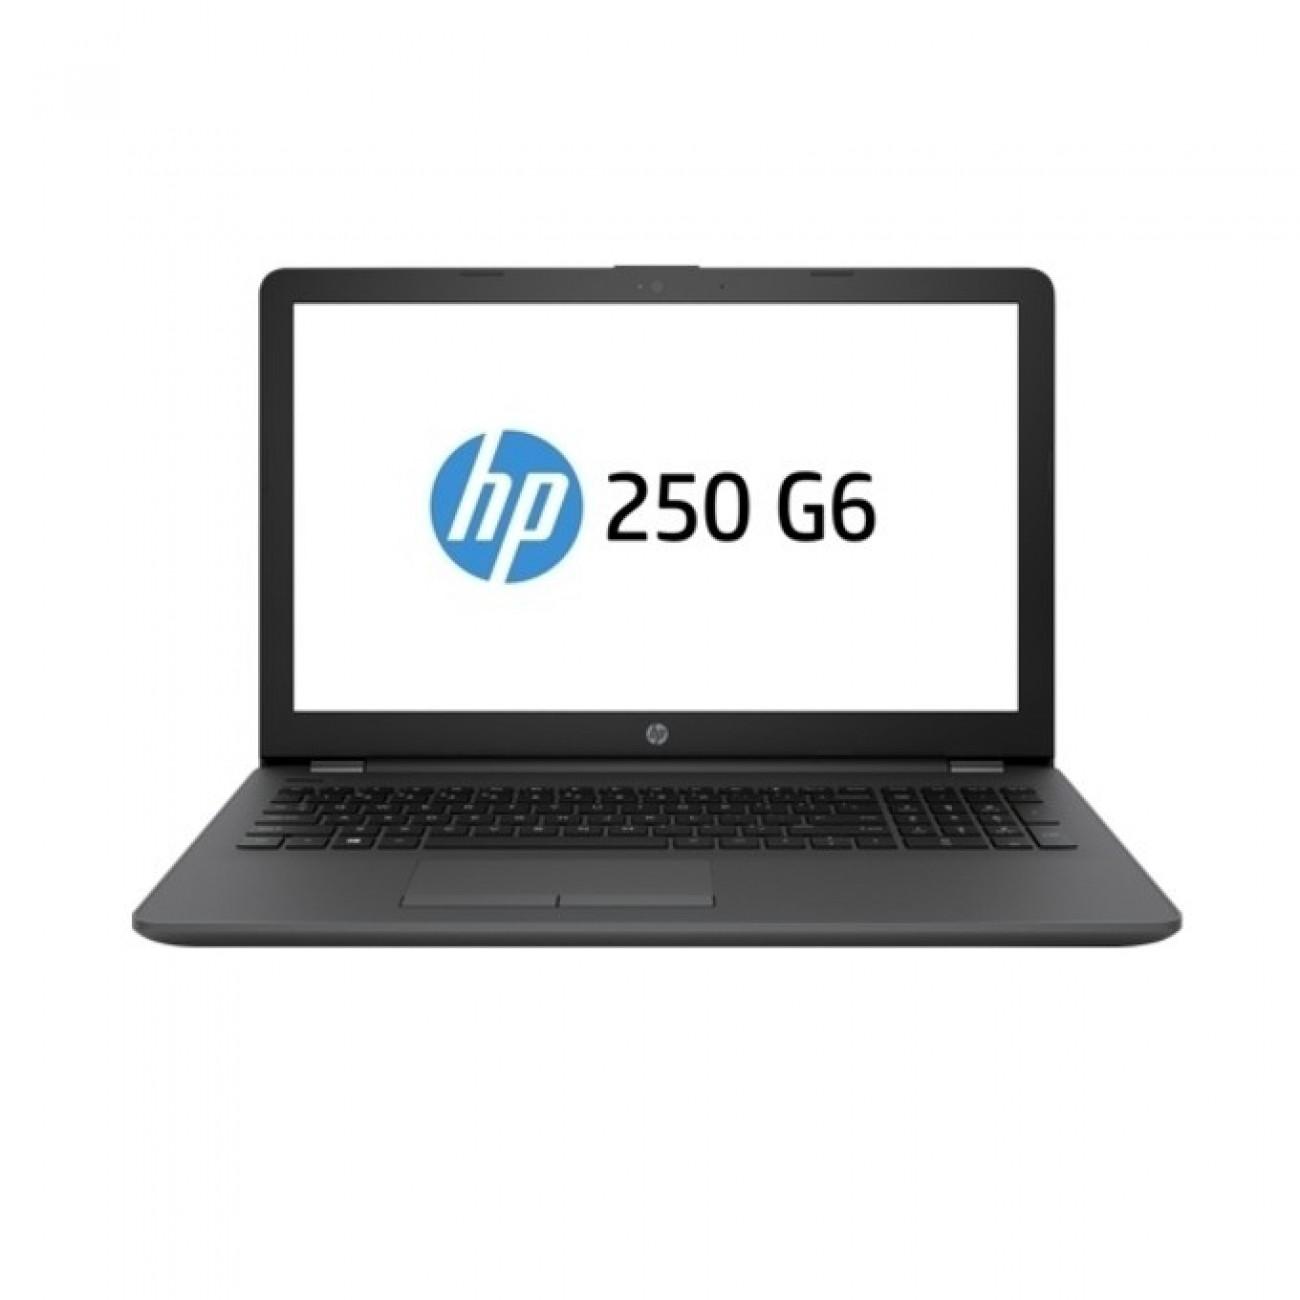 Лаптоп HP 250 G6 (4LT72ES)(сив), двуядрен Kaby Lake Intel Core i3-7020U 2.3 GHz, 15.6(39.62 cm) Full HD Anti-Glare Display&AMD Radeon 520 2GB(HDMI), 8GB DDR4, 1TB HDD, Free DOS, 1.86 kg в Лаптопи -  | Alleop